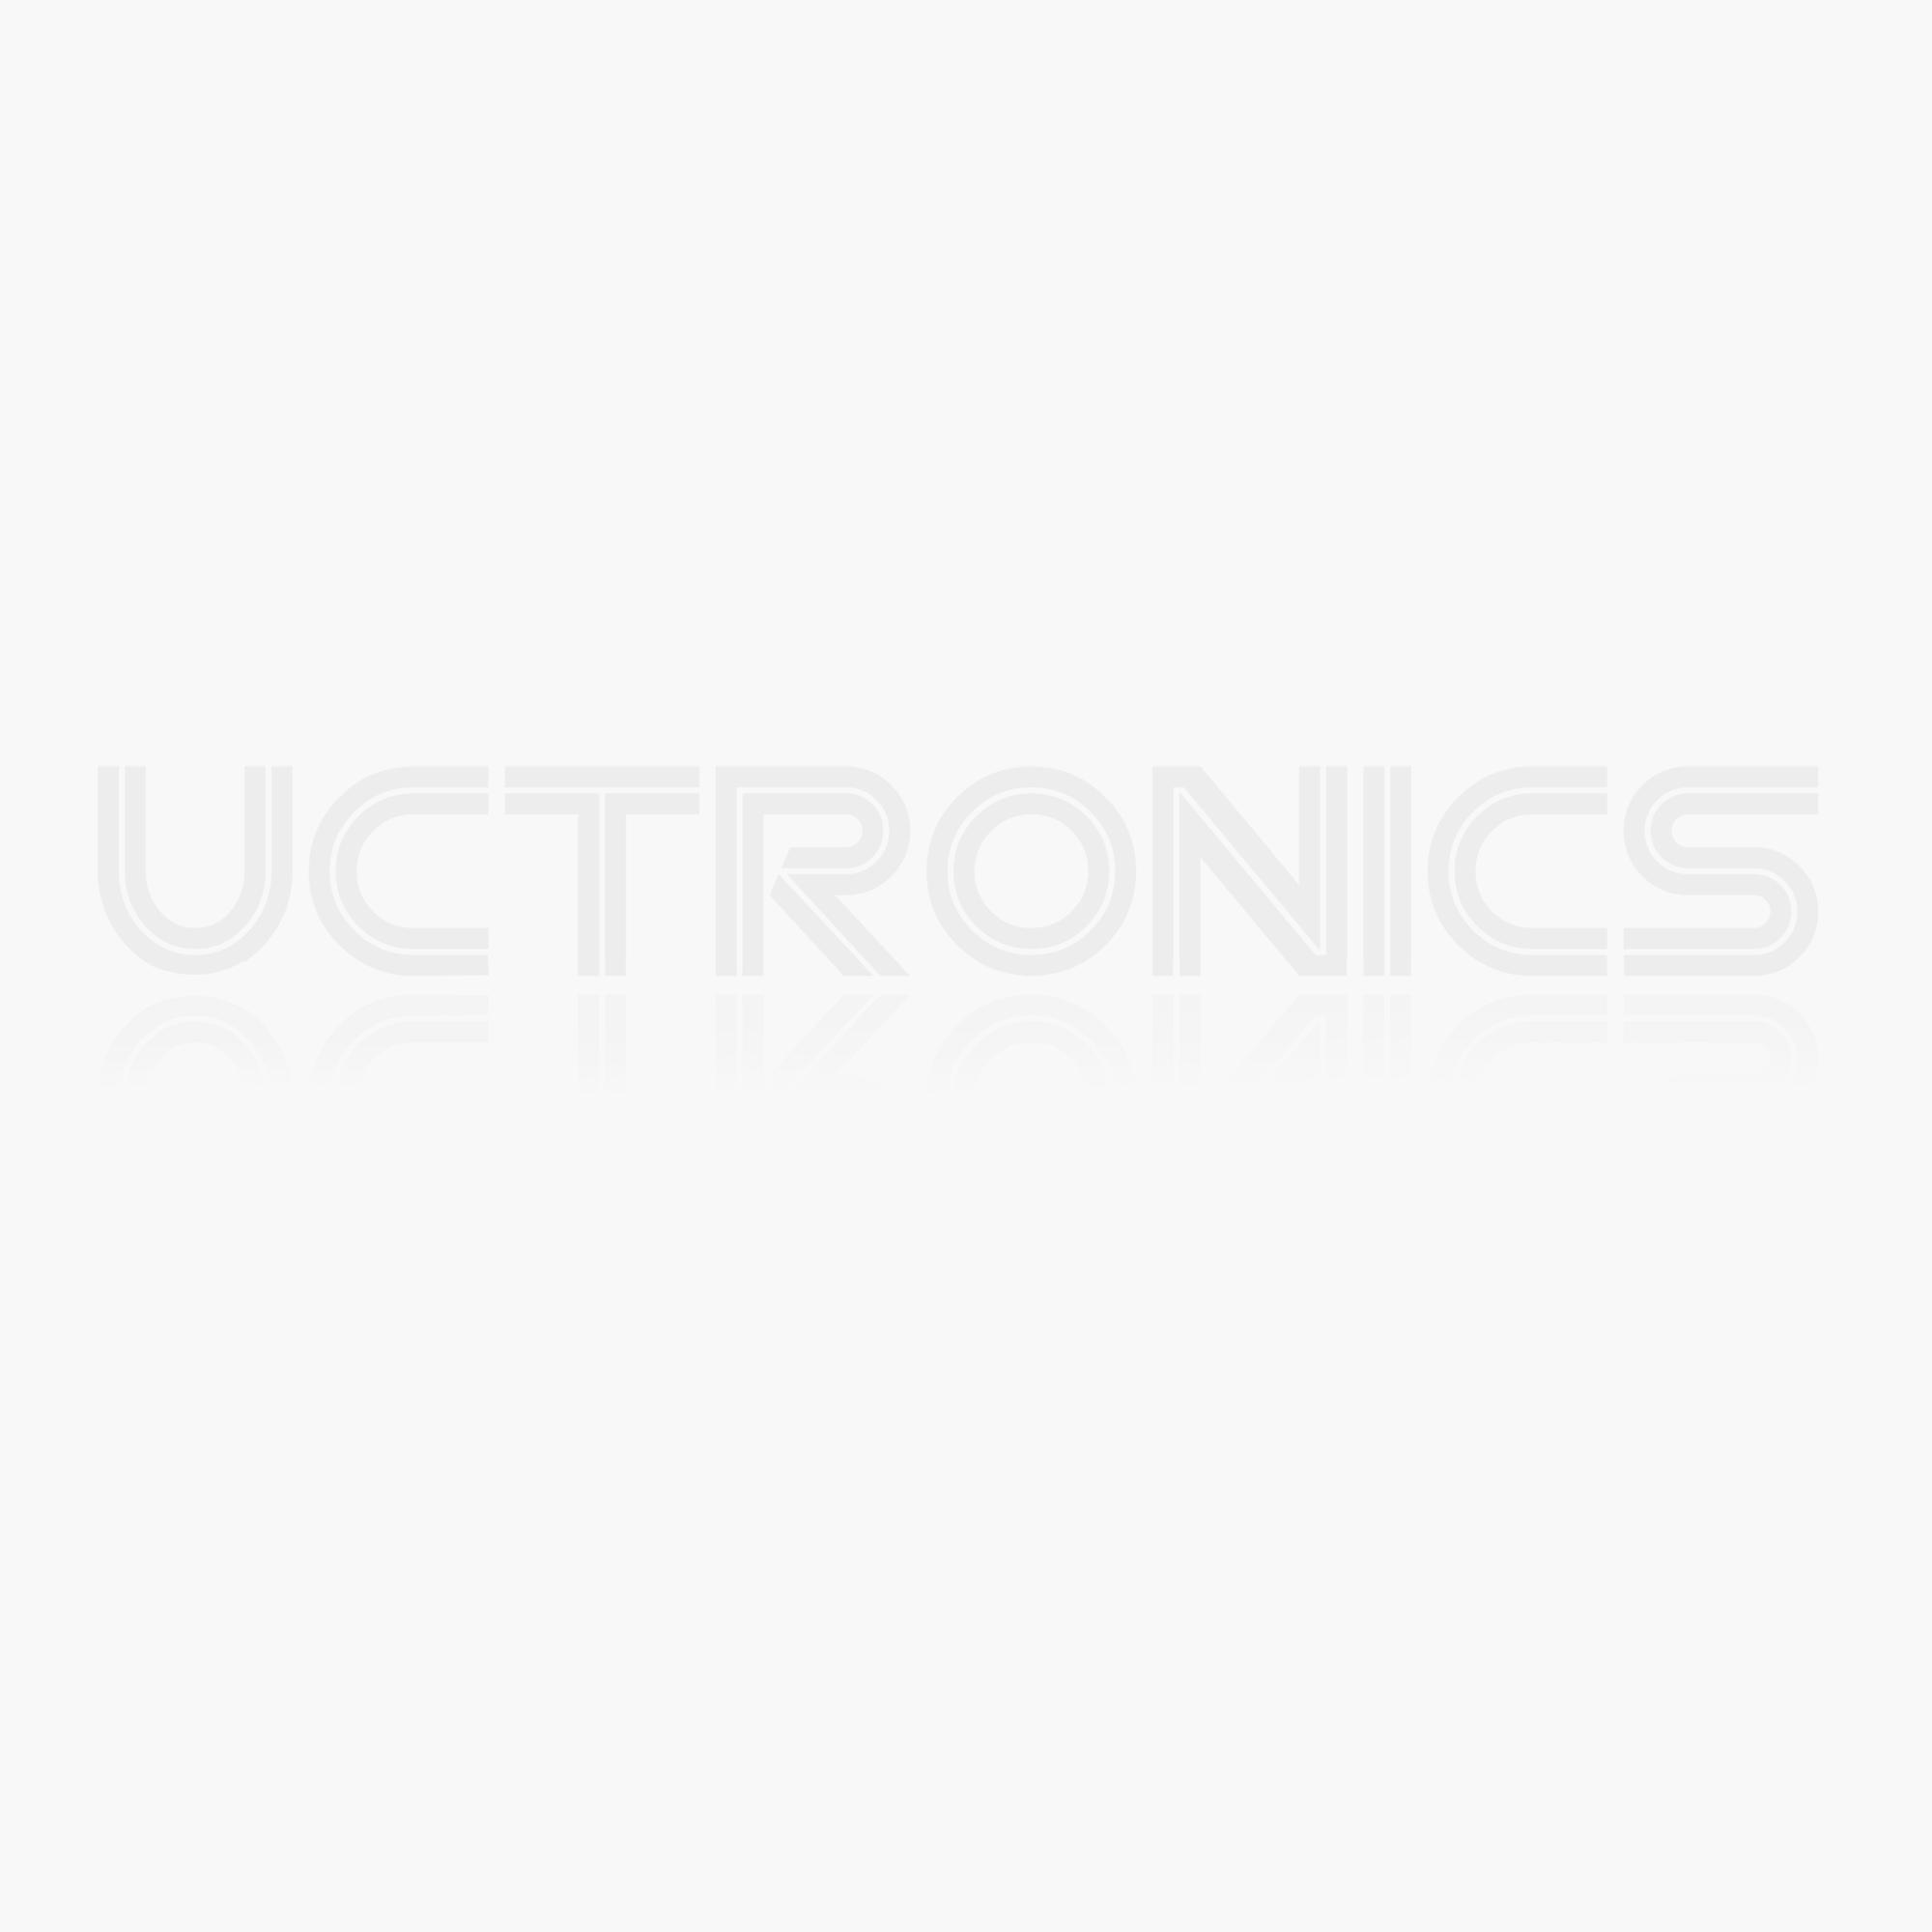 HX711 Weighing Sensor 24-bit A/D Conversion Adapter Load Module for Arduino MCU